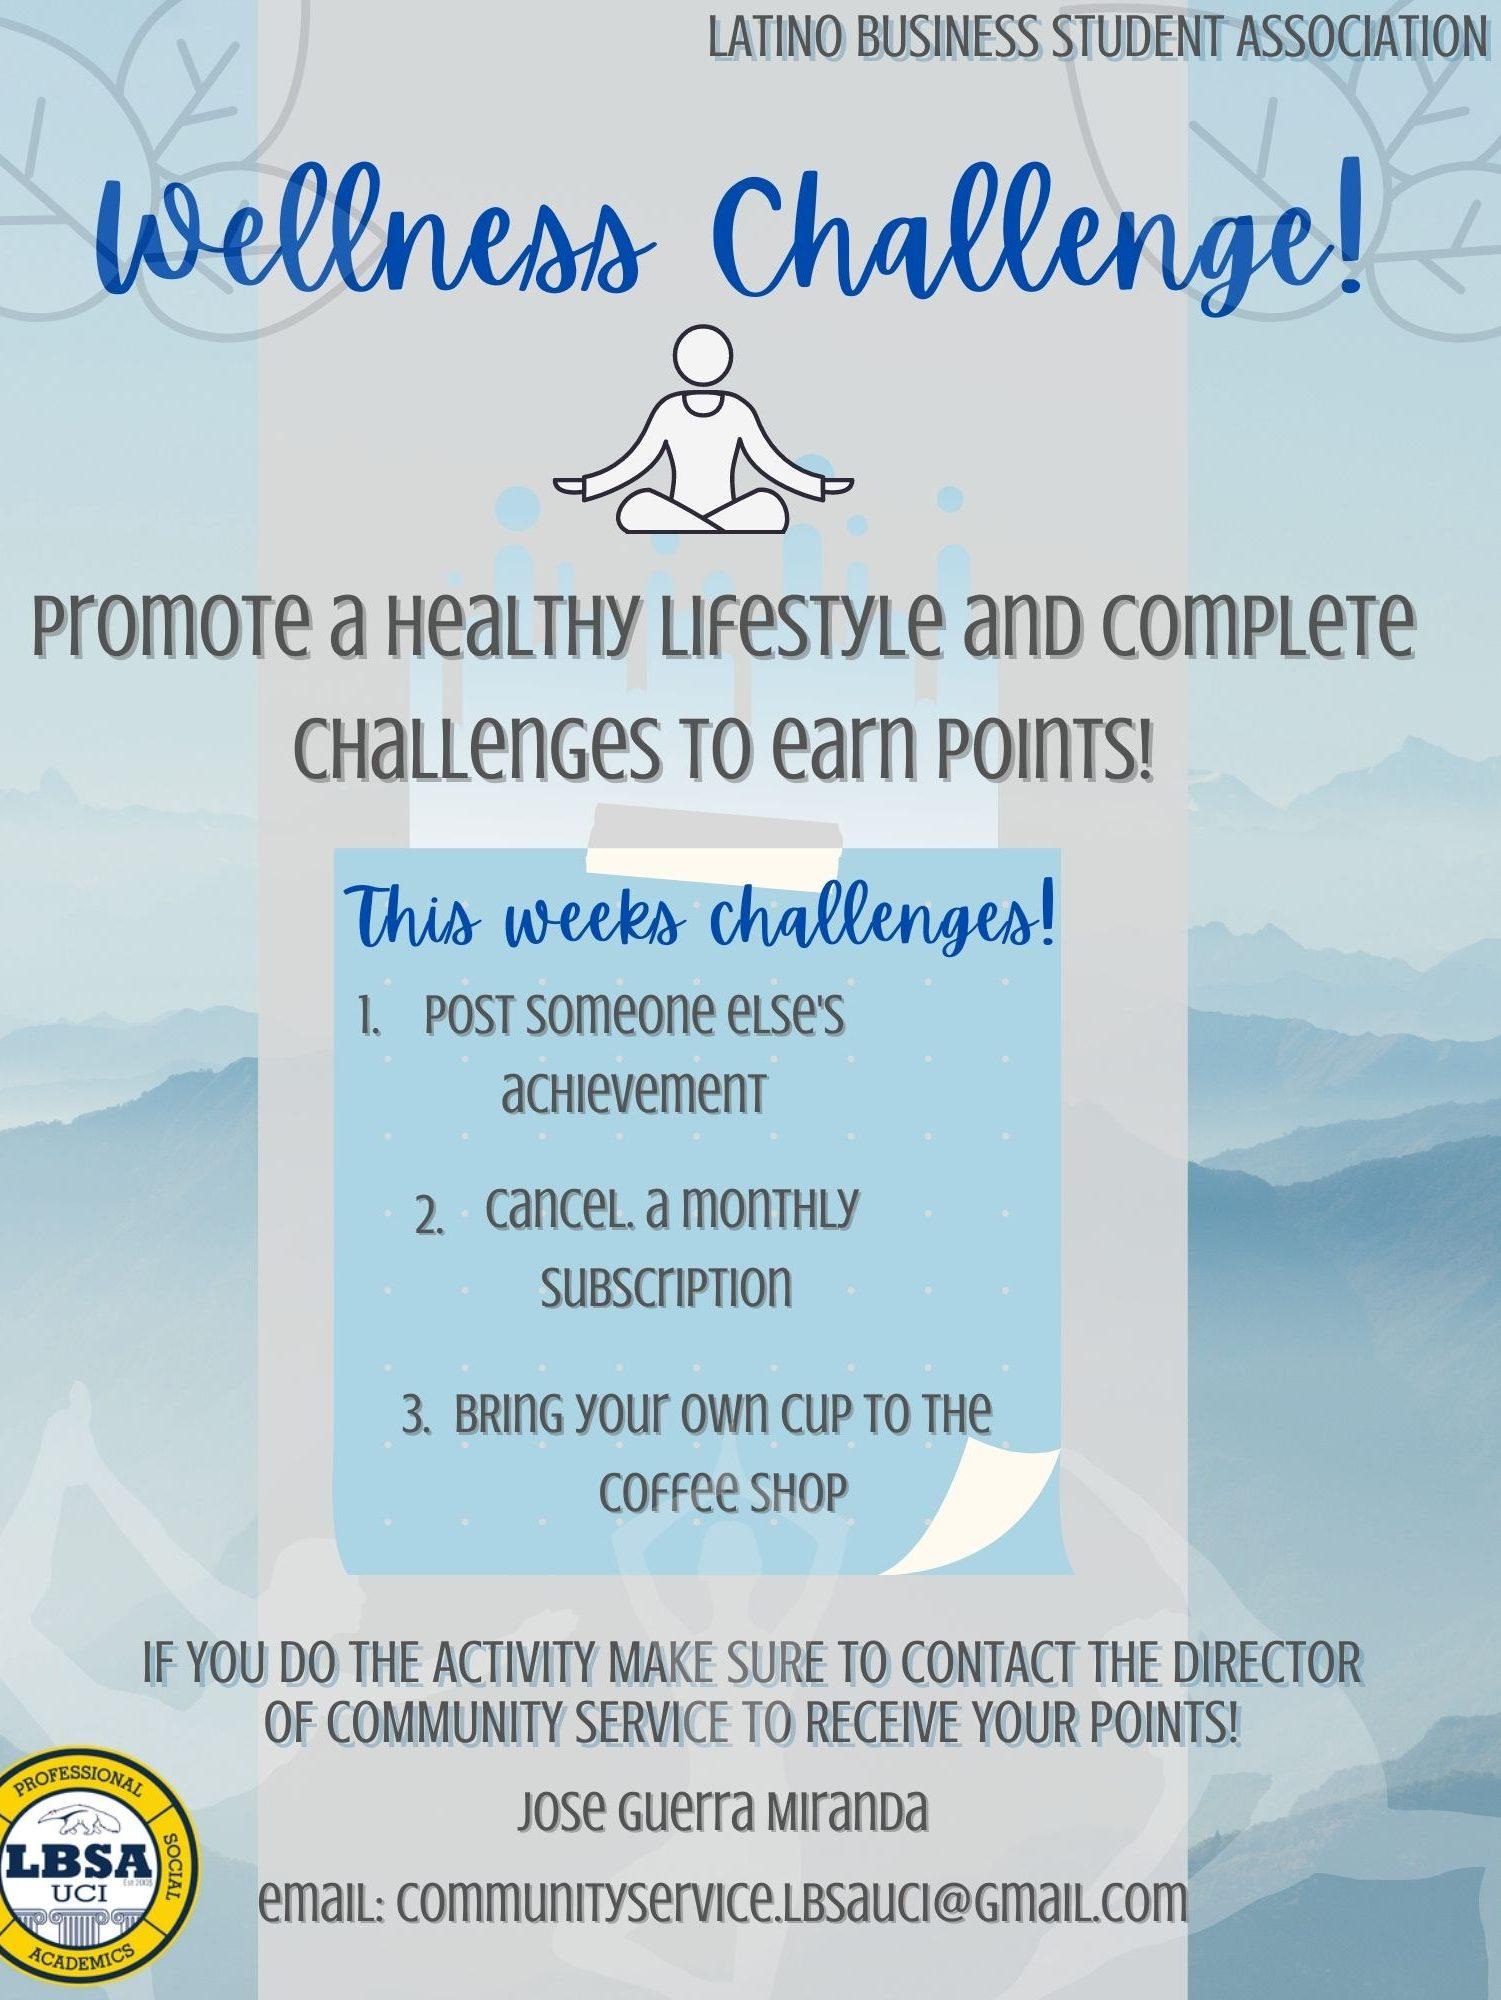 wellness challenges-4 - Jose Guerra Miranda